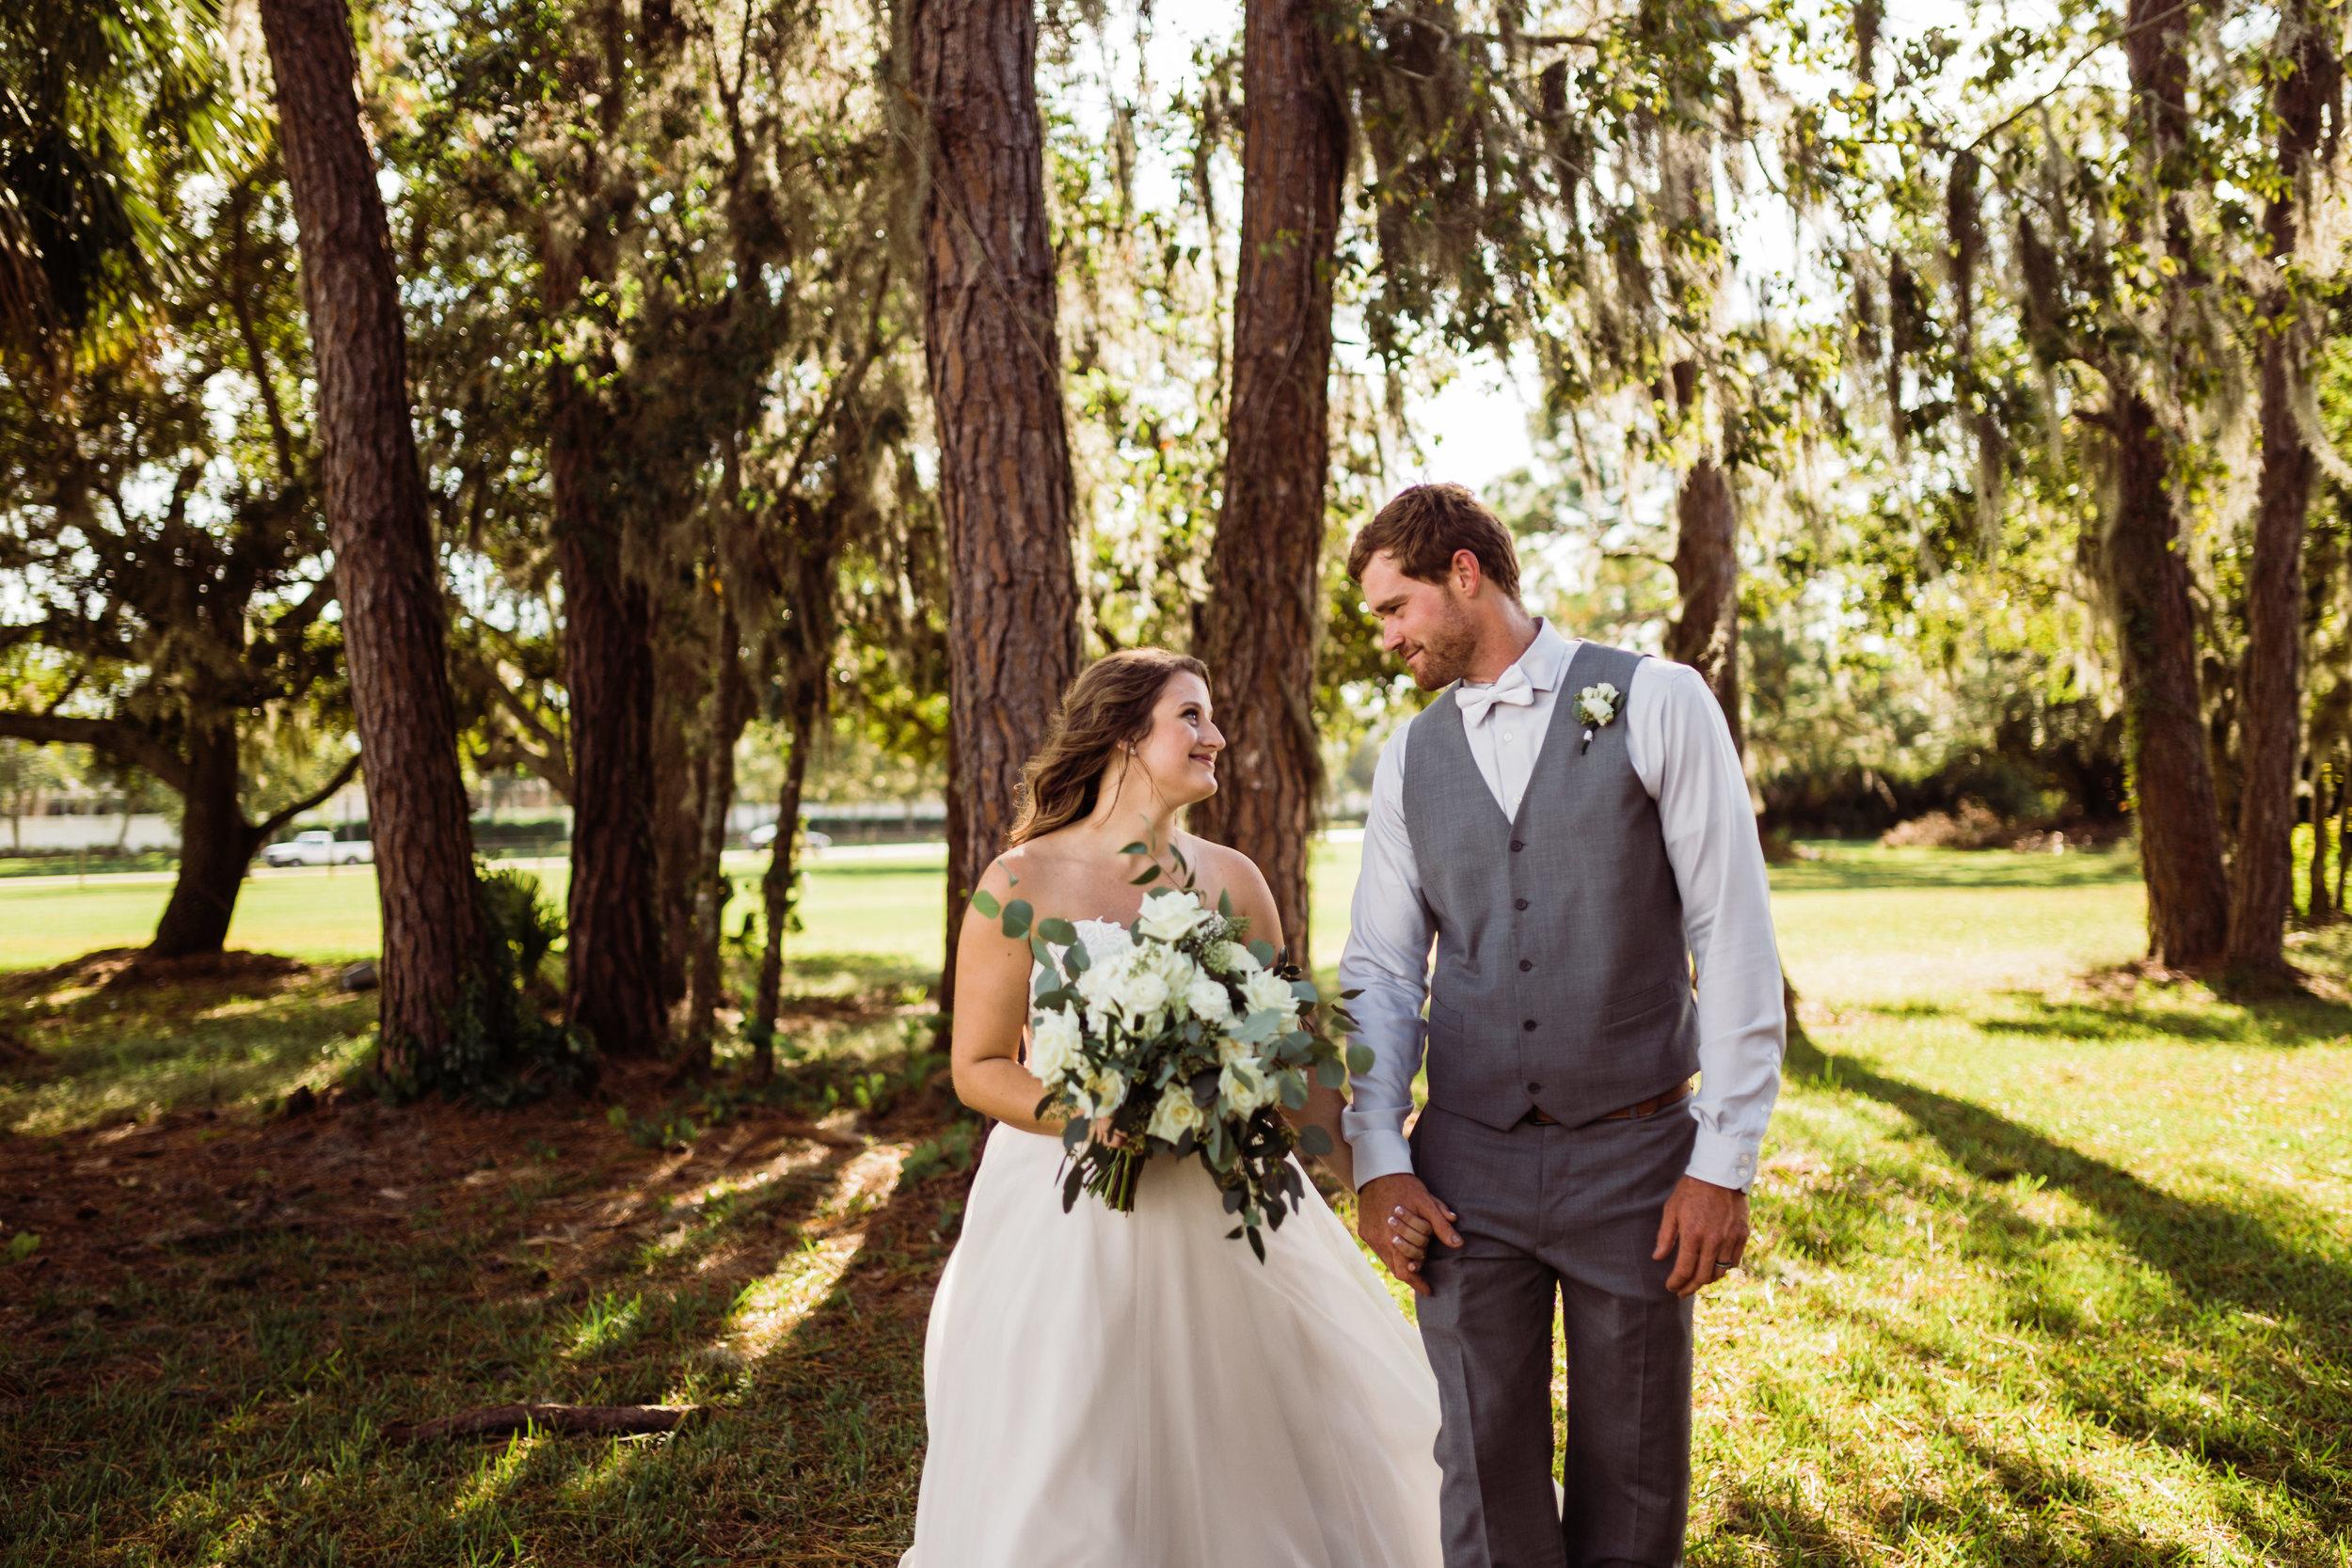 2017.10.14 Samantha and Matthew Crabtree Sarasota Wedding (343 of 708).jpg